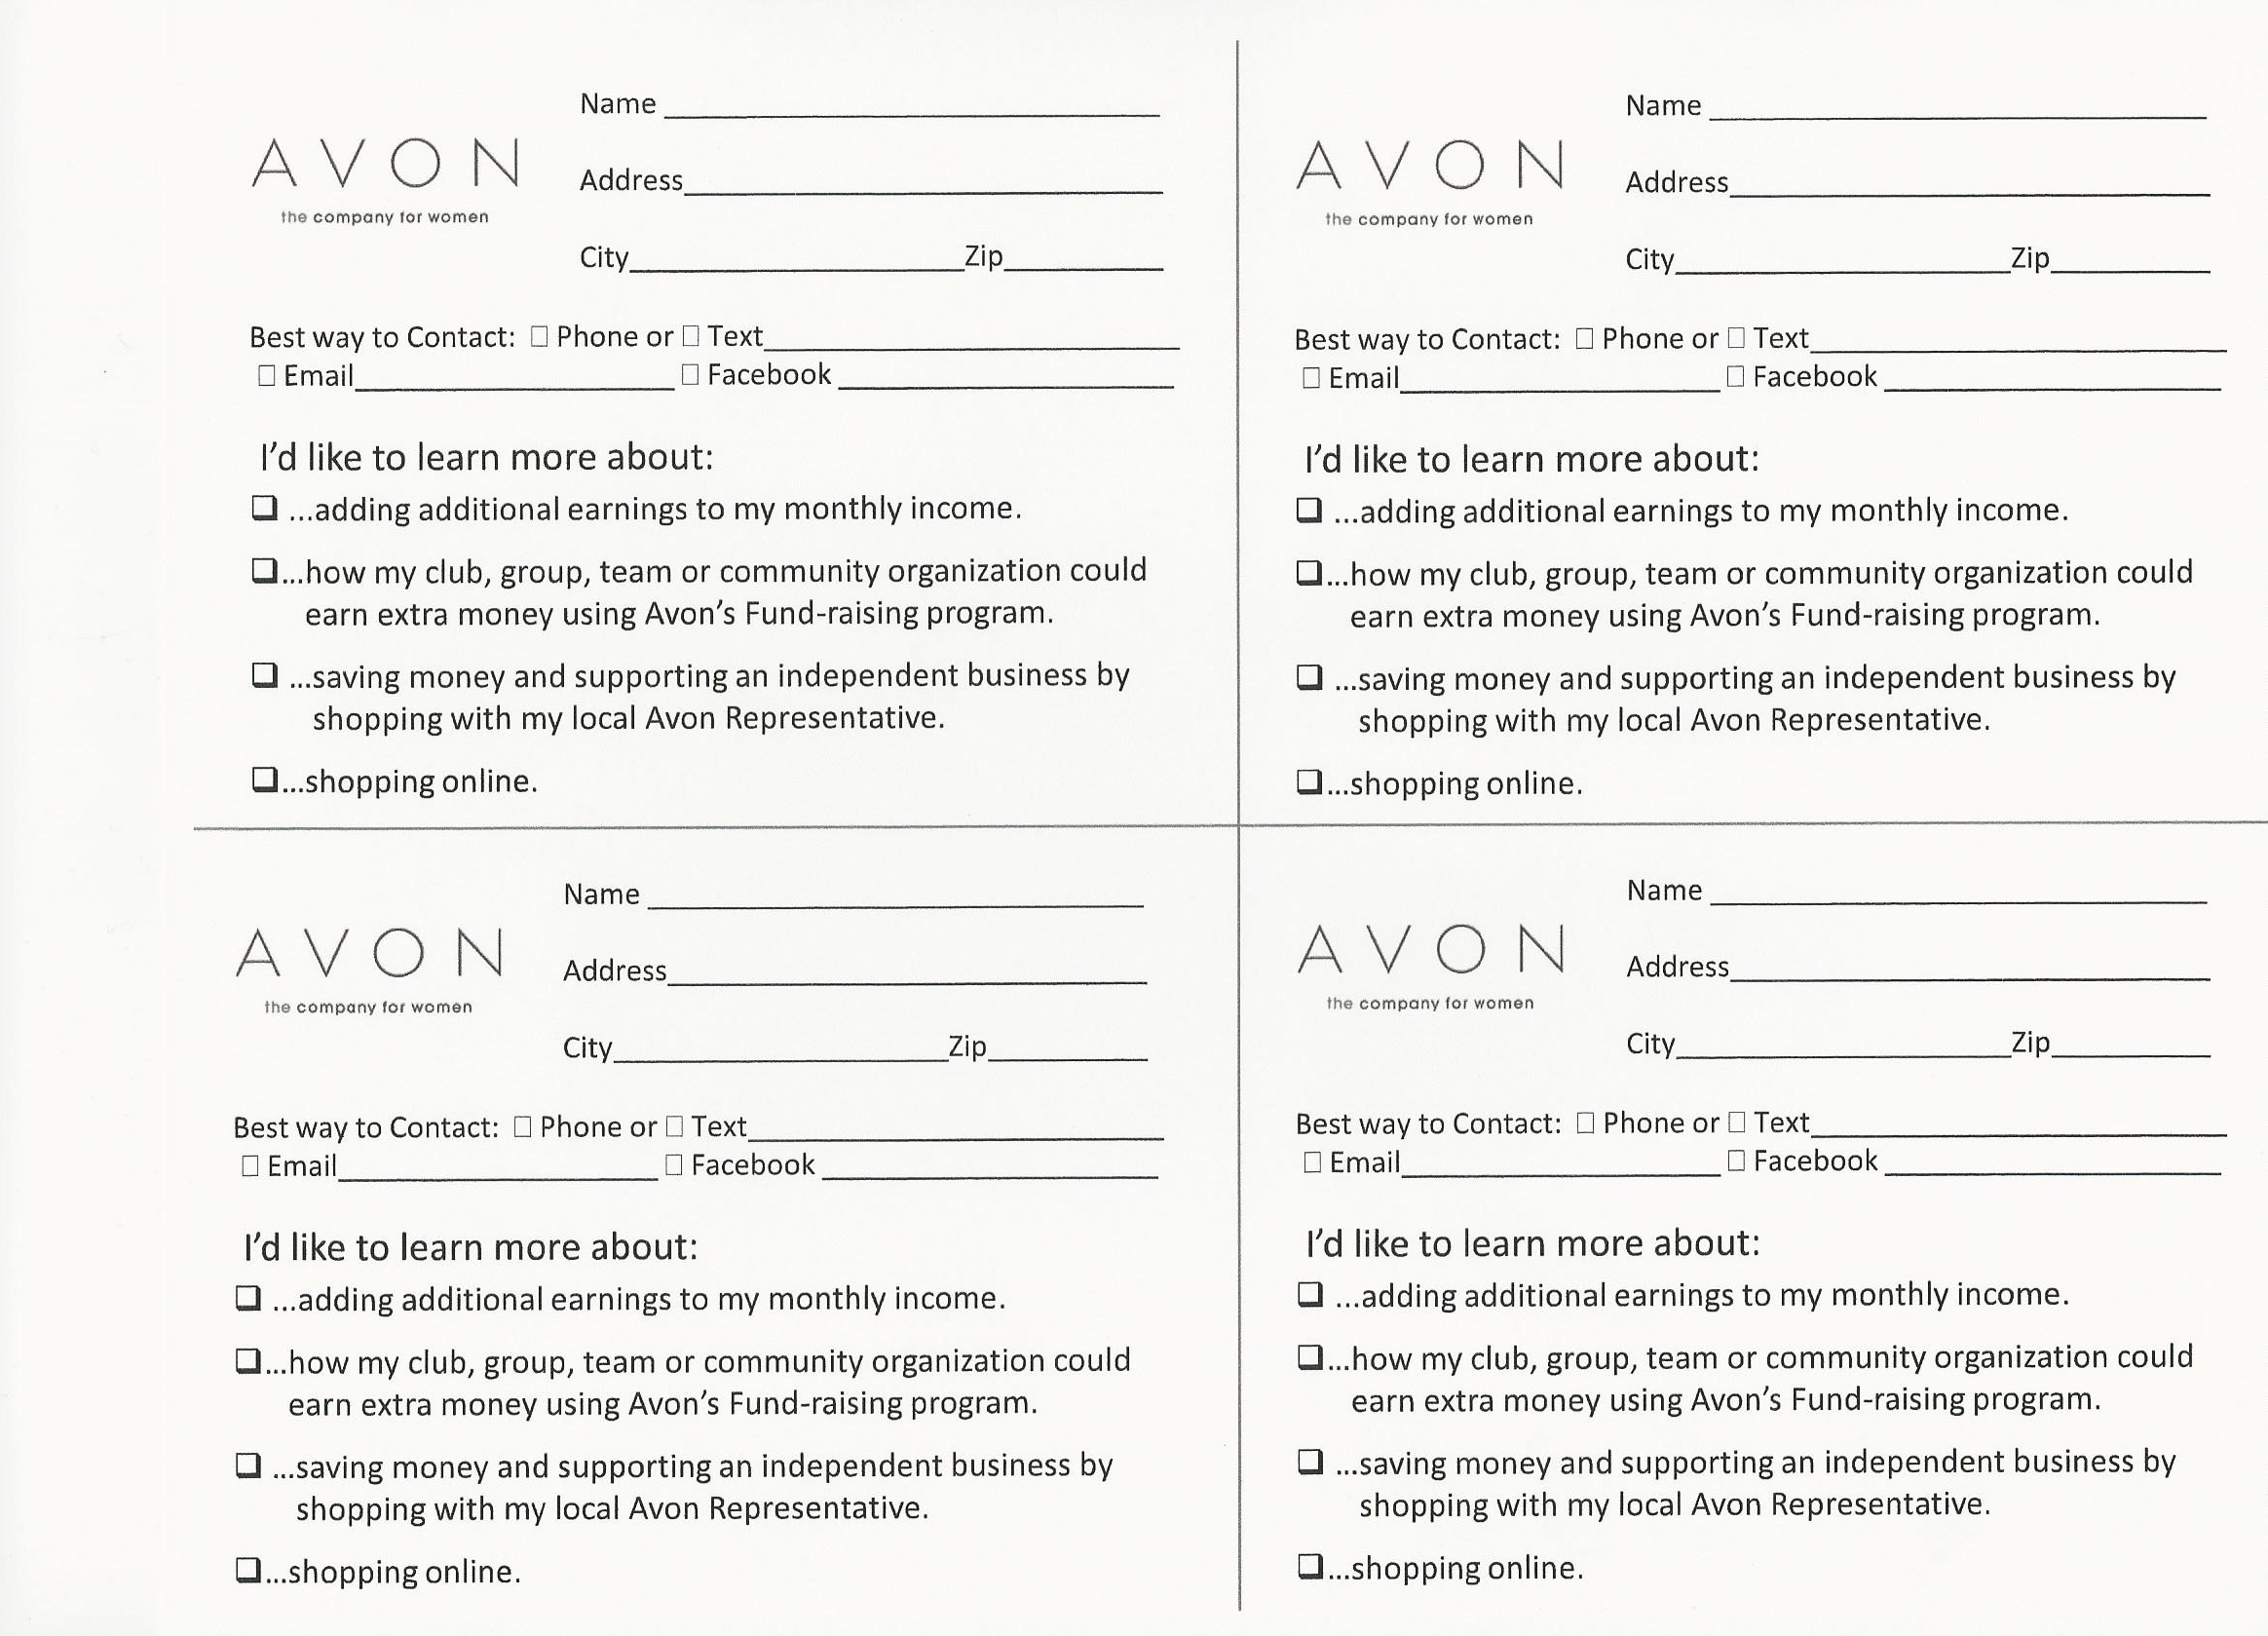 Avon Flyers & Charts | Avon Beauty - Free Printable Avon Flyers